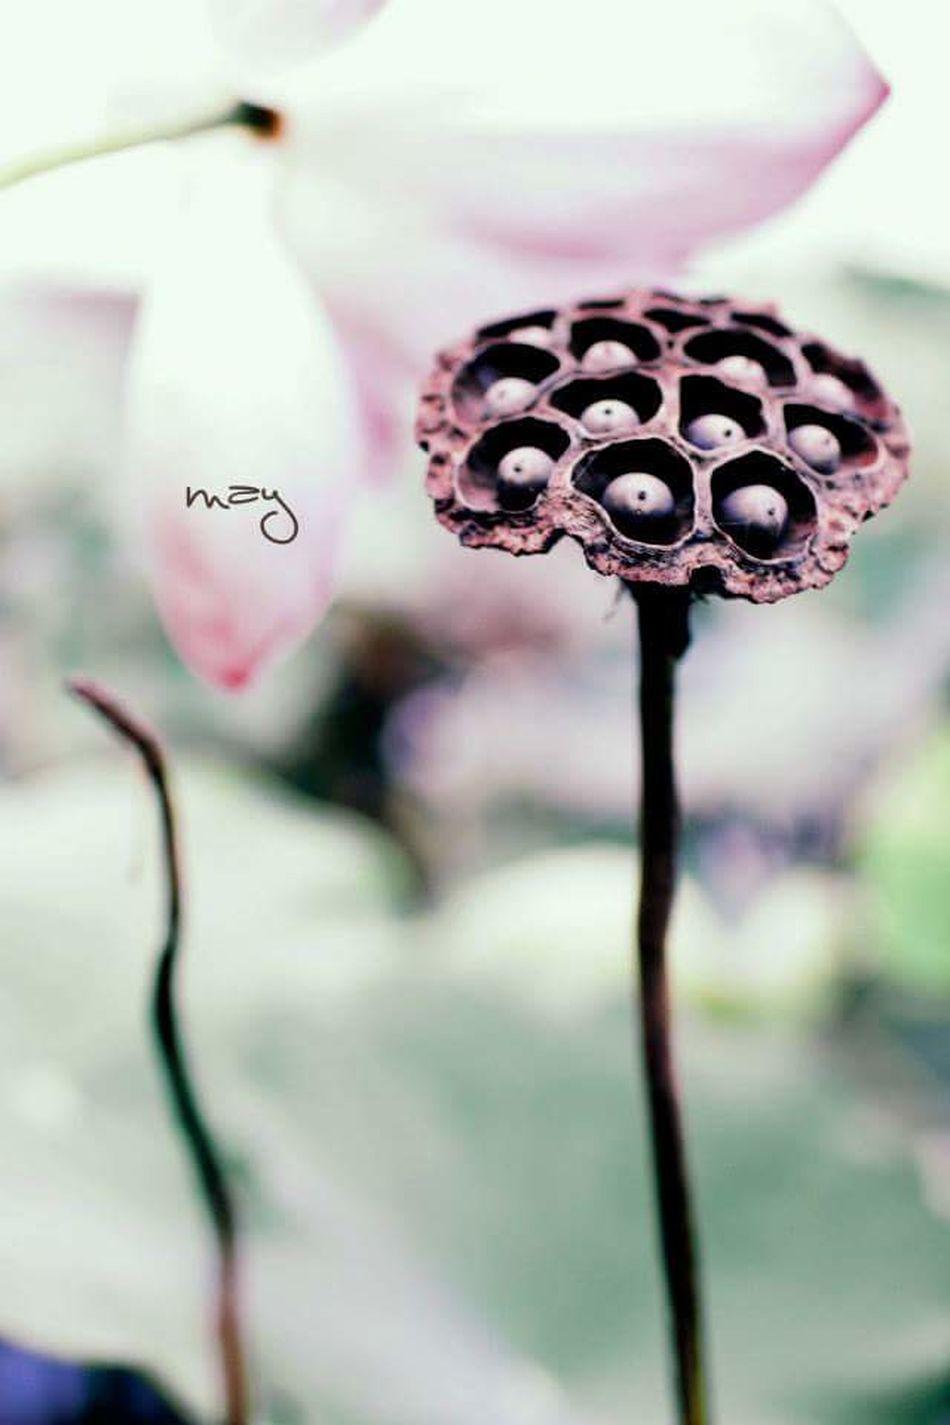 Summer gone... Lotus♥ Lotus Flower Summer Memories 🌄 ĐồngTháp Dongthap Vietnam Vietnamcharm